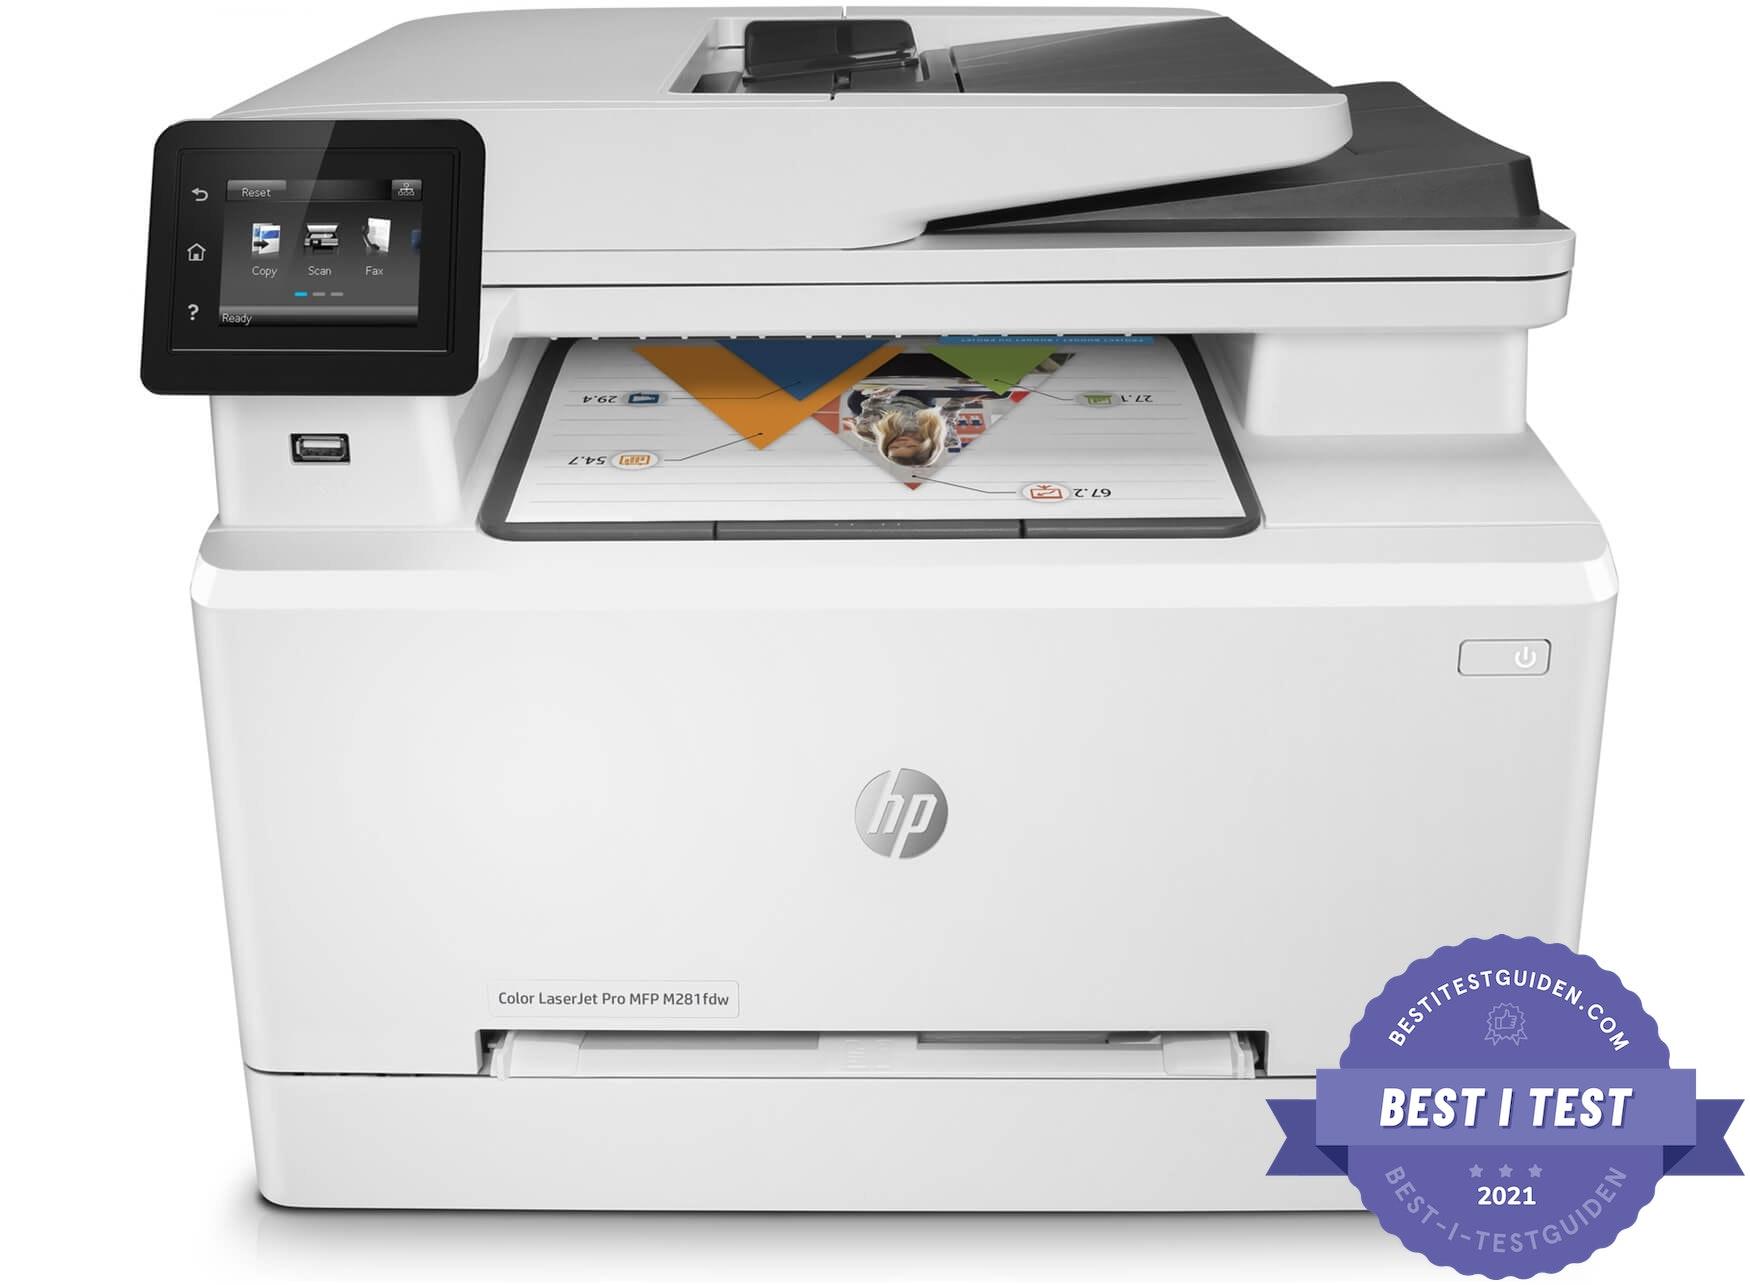 HP Color LaserJet Pro M281fdw - Best i test 2020